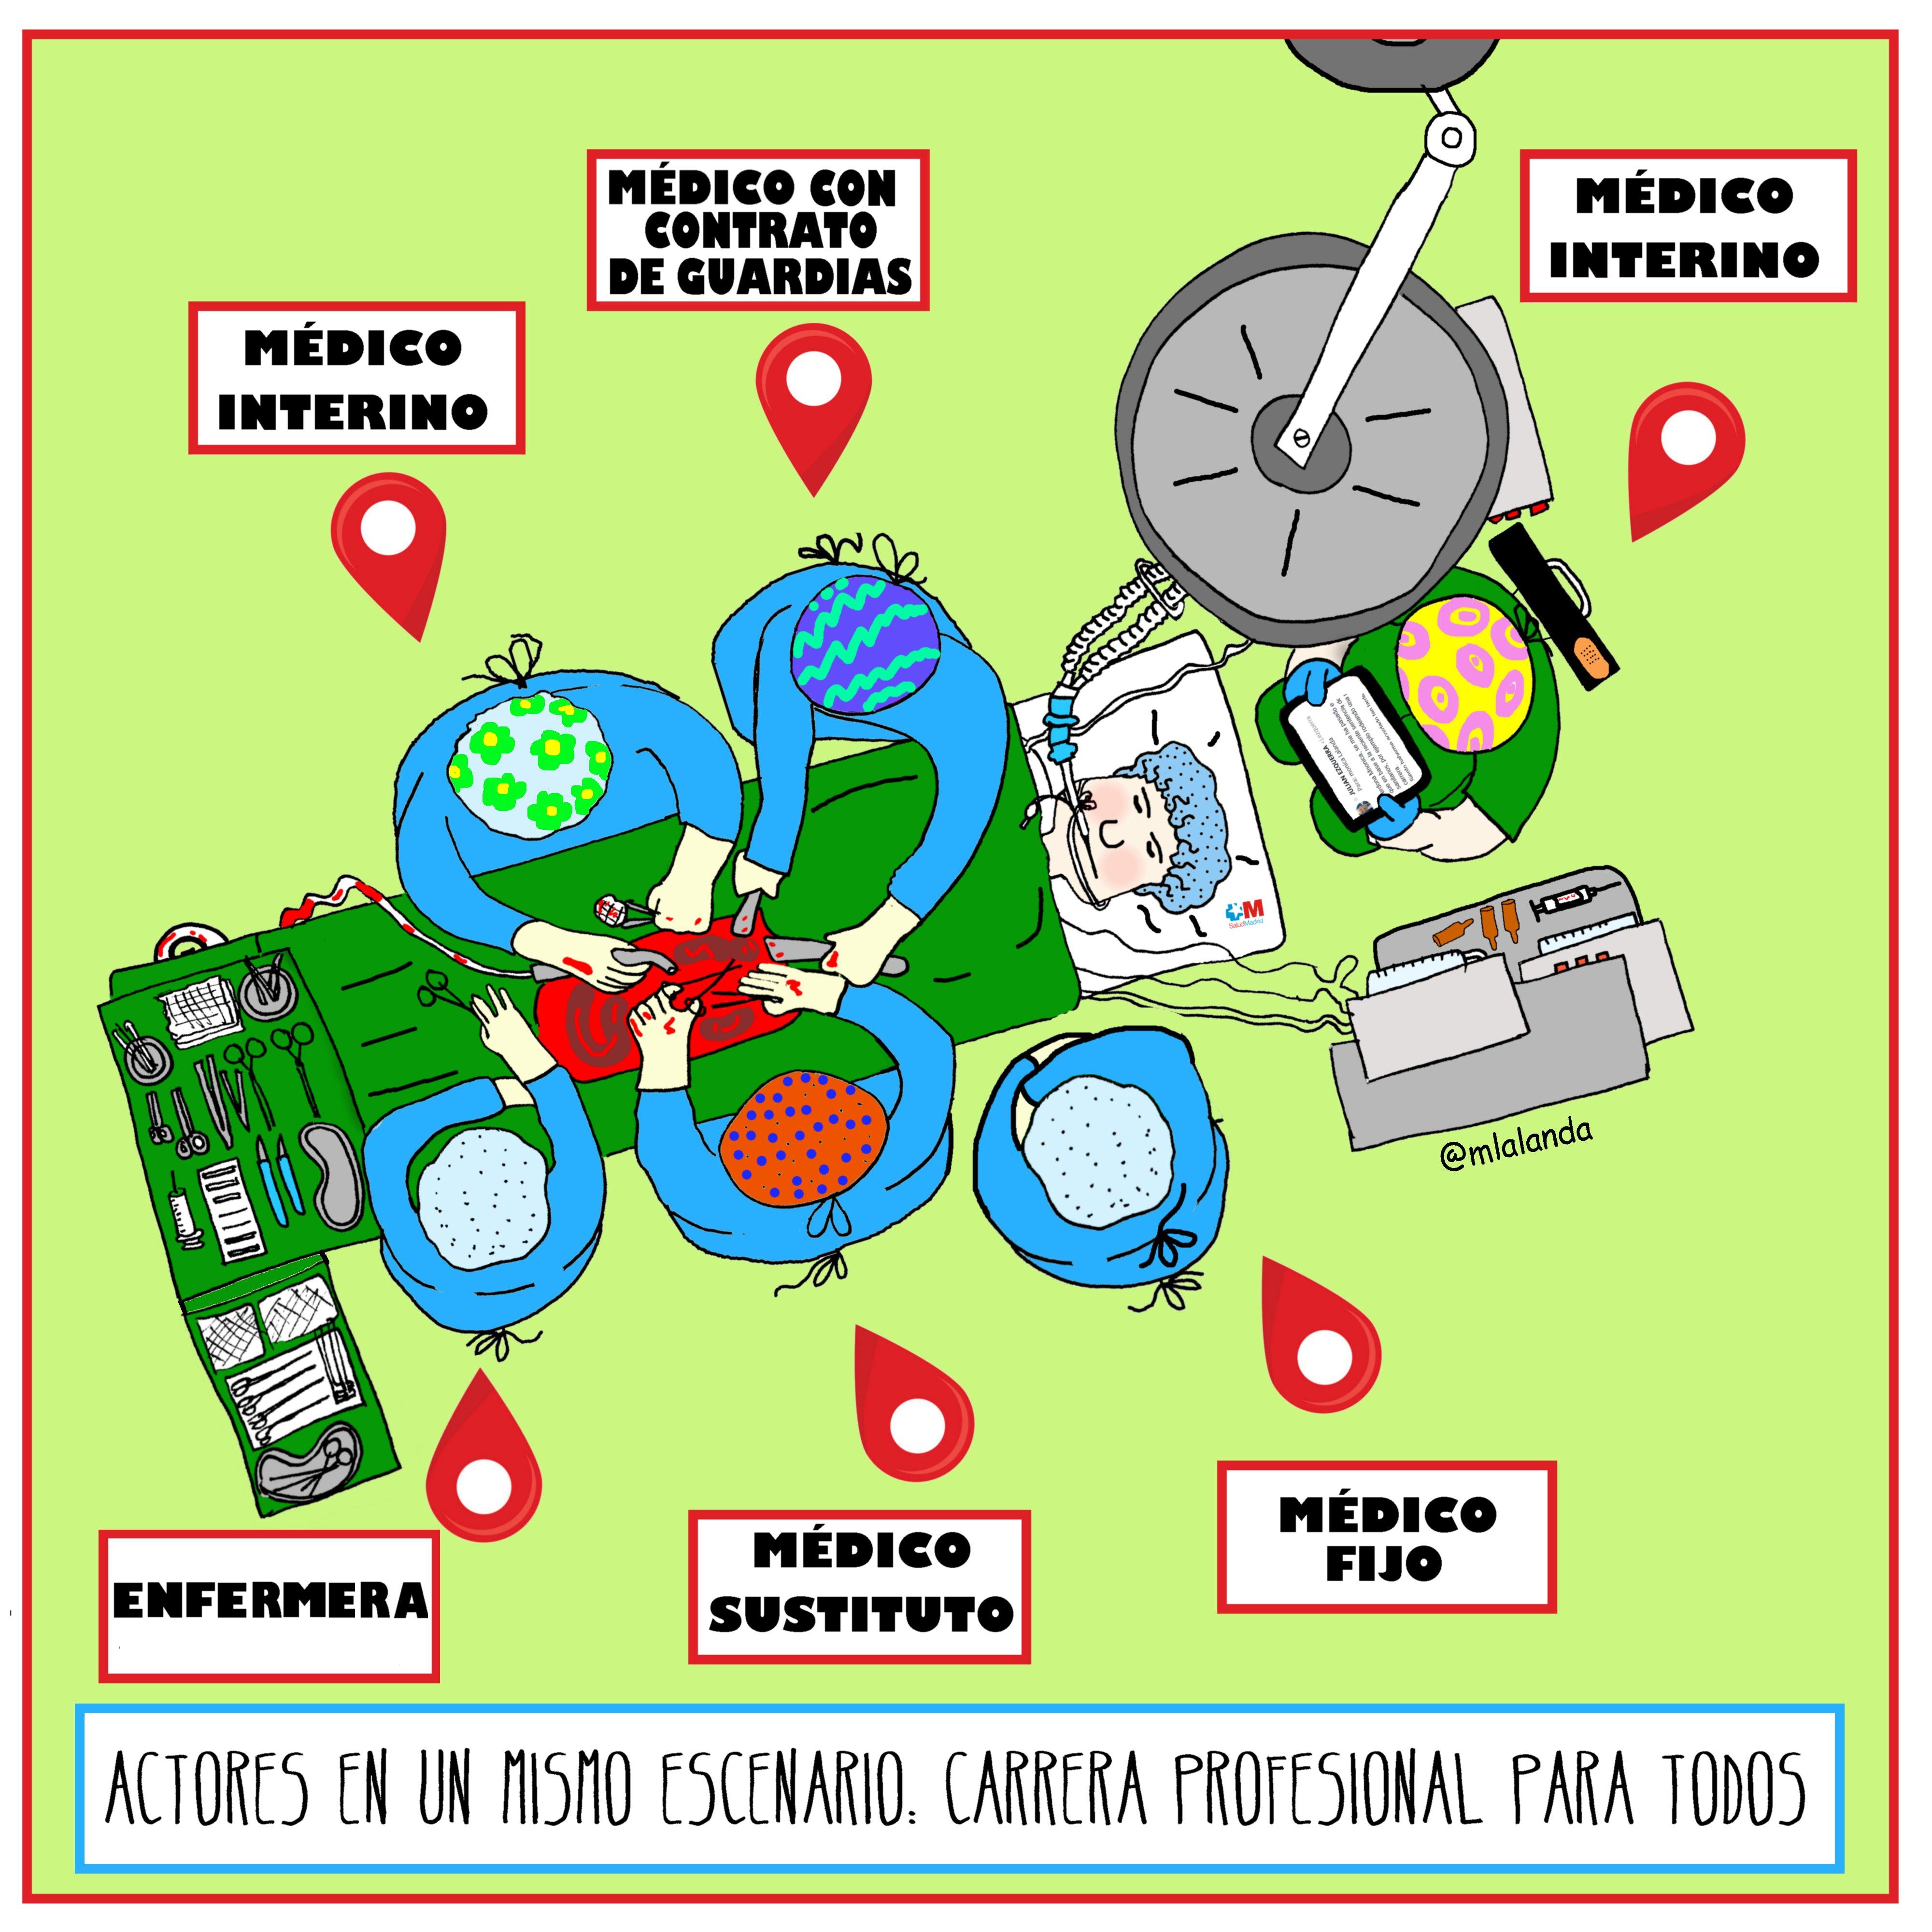 20190329 CONTRAPORTADA_Carrera Profesional